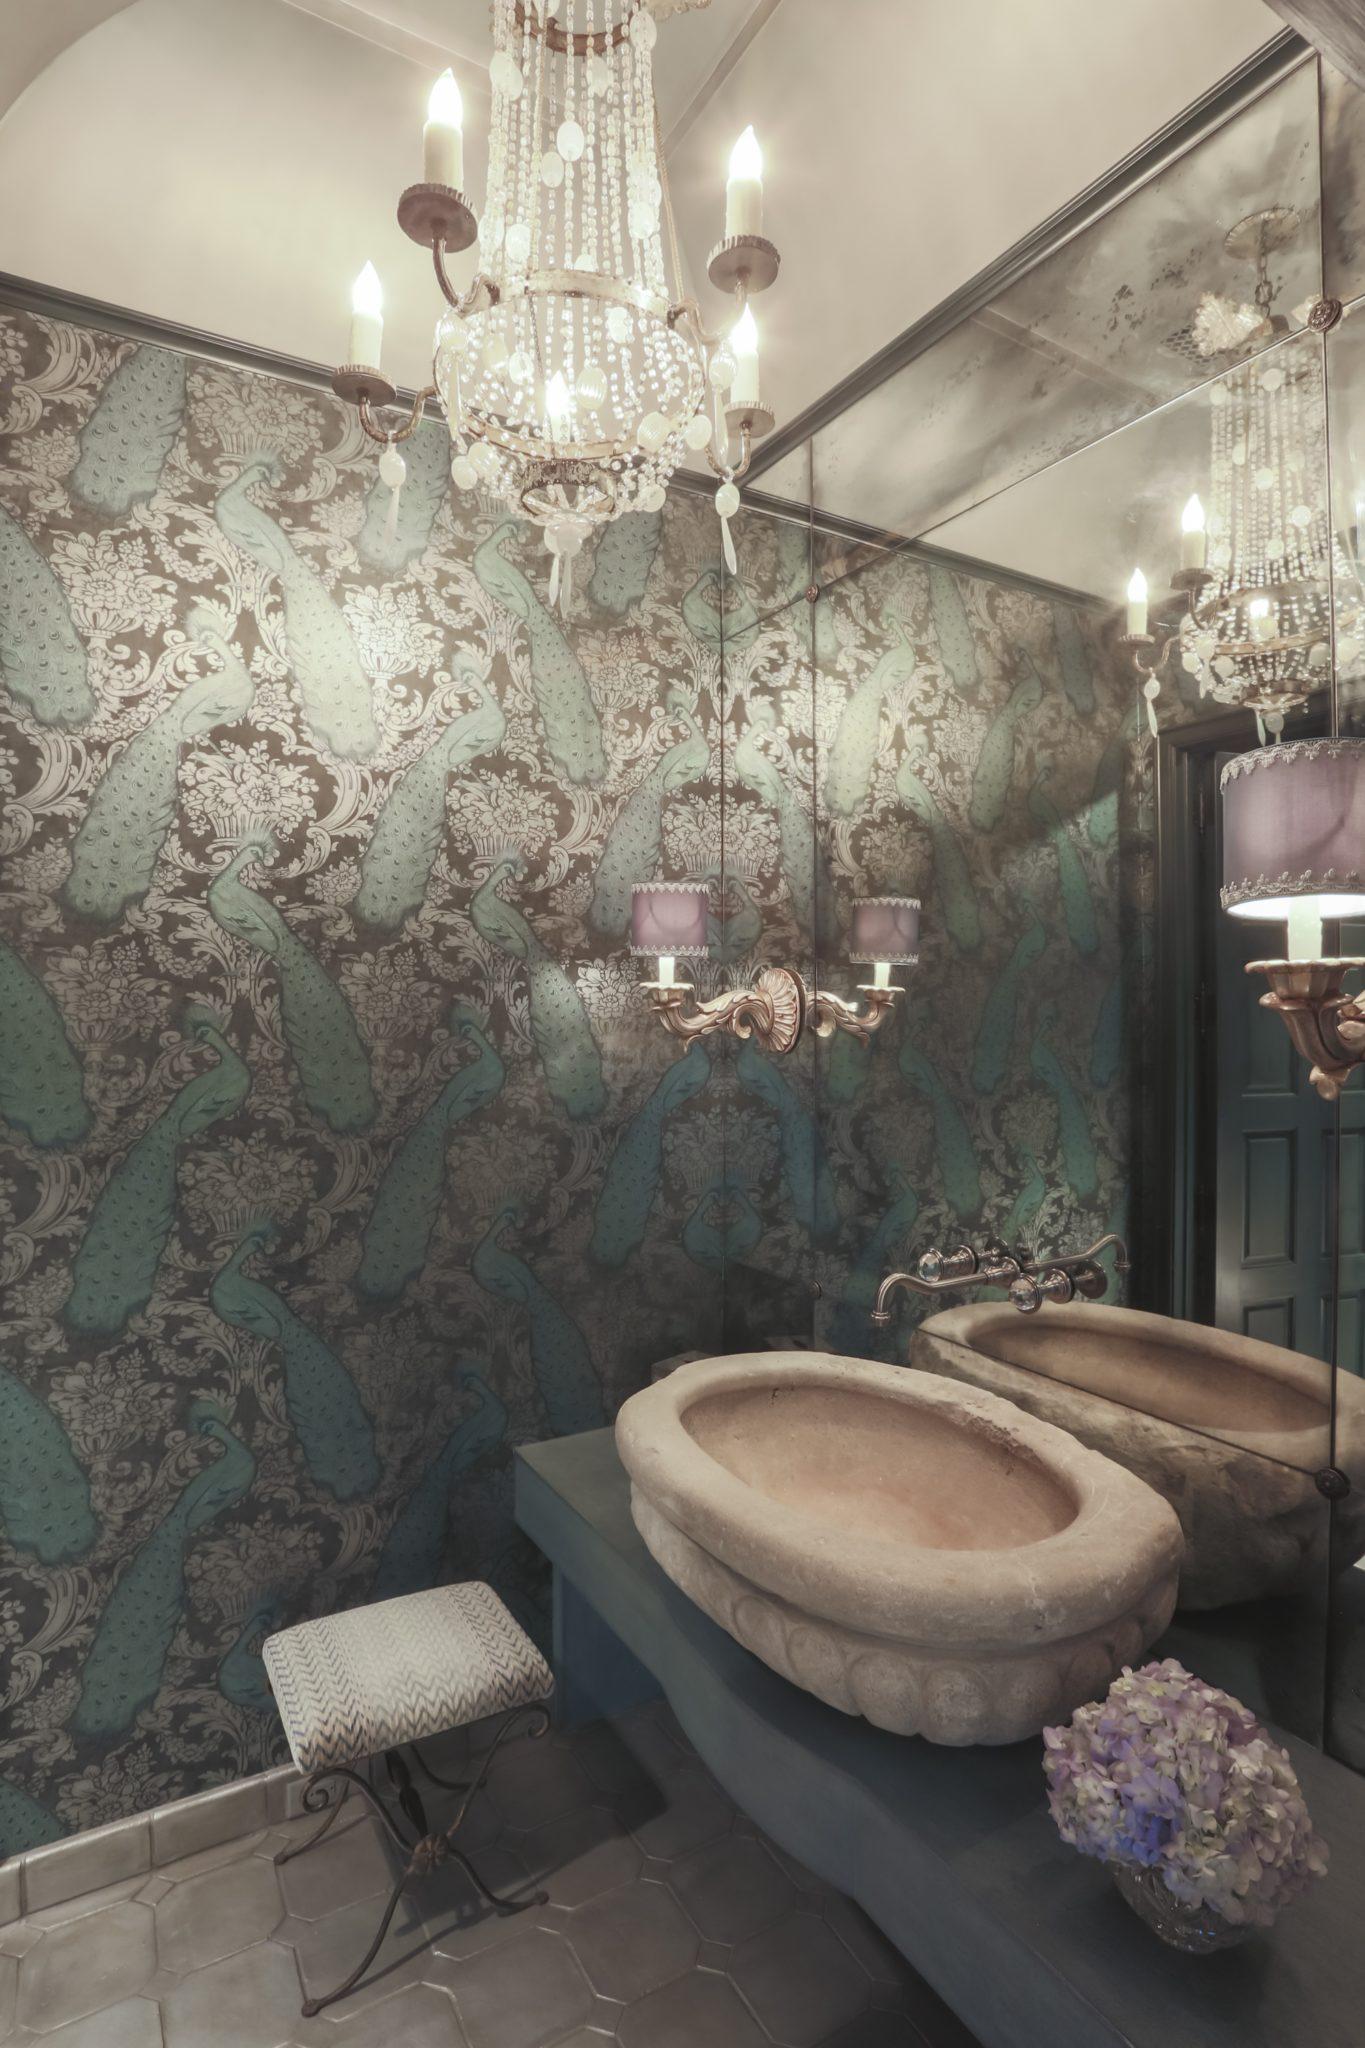 Formal powder- reclaimed stone sink, metallic wallpaper & antique mirrored wall by Nicole Zarr & Associates